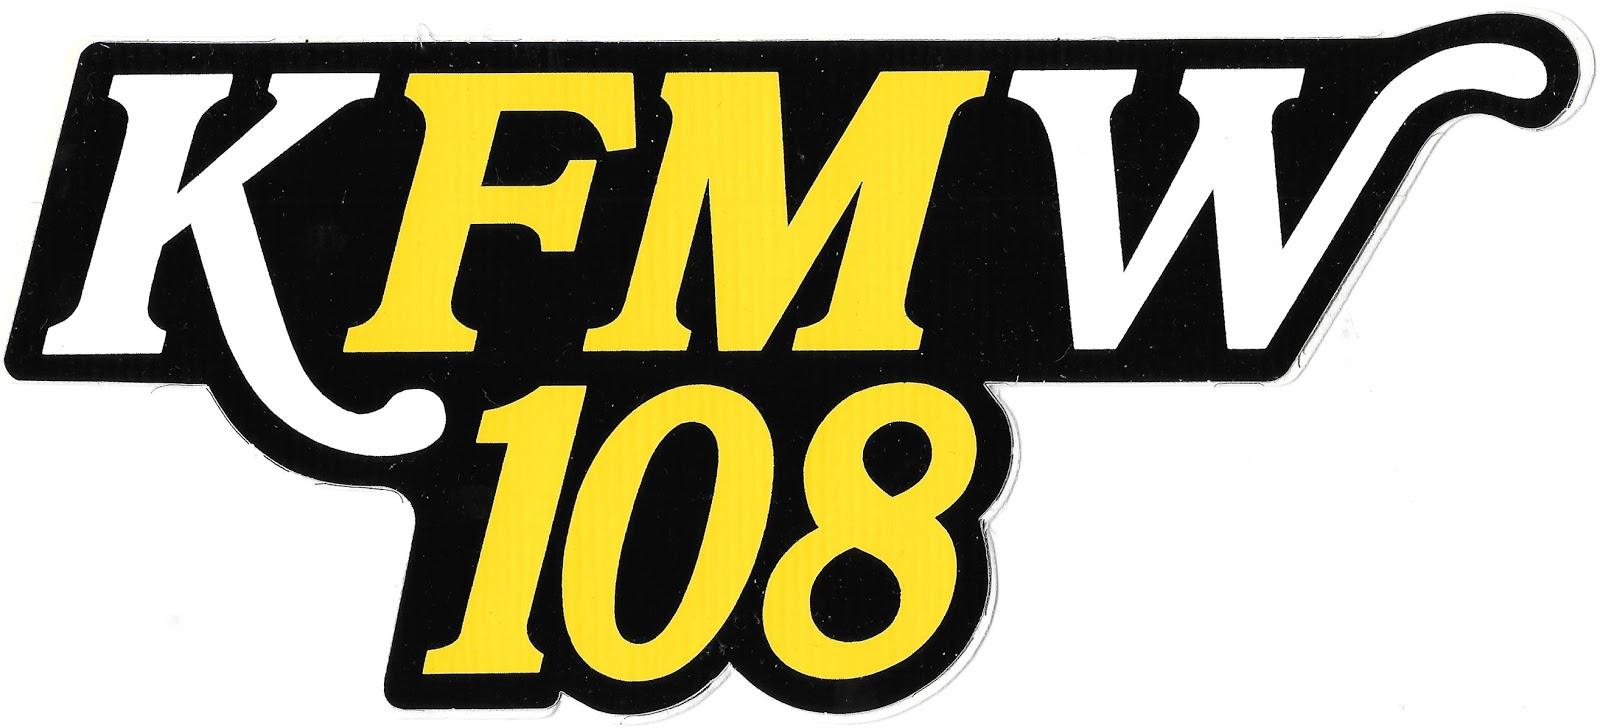 rock 108 waterloo iowa